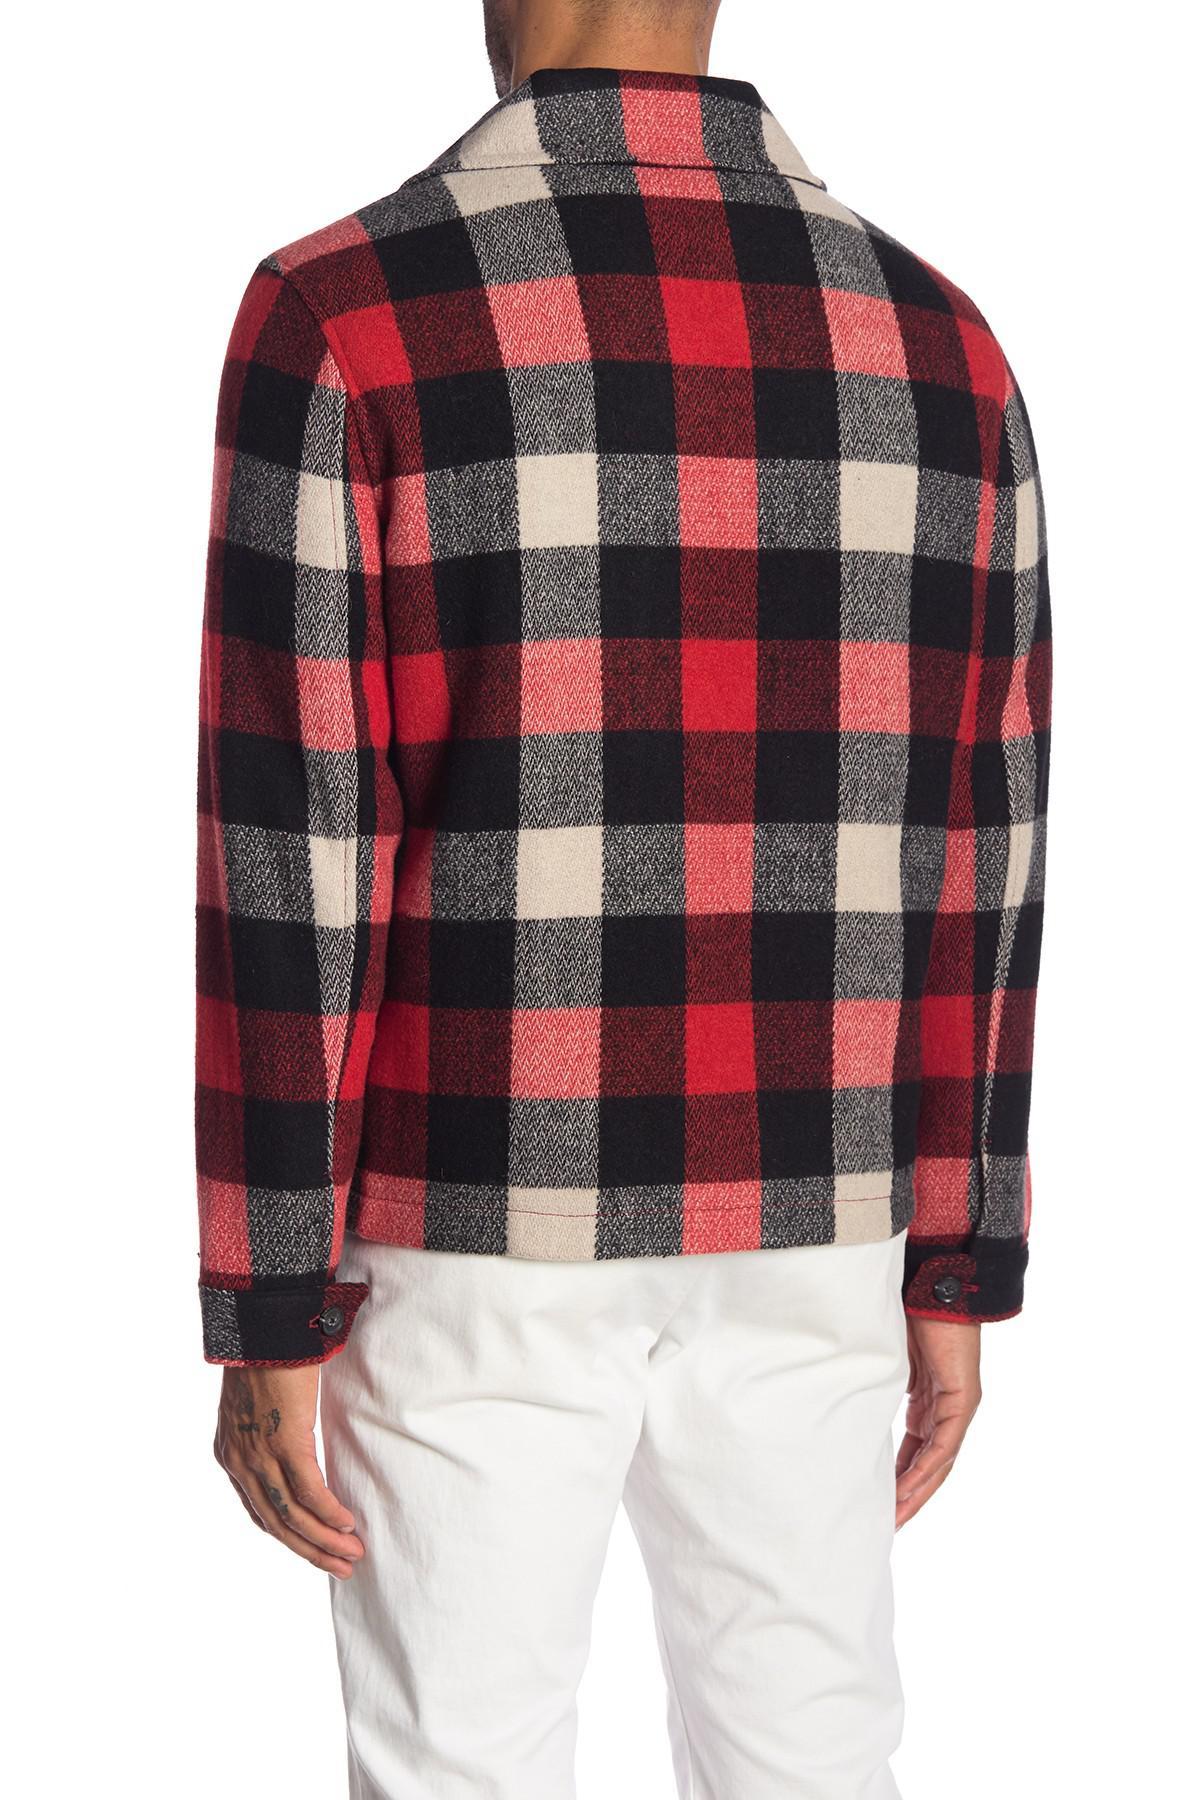 9d491f388a85a Lyst - Calvin Klein Mackinaw Harrington Plaid Jacket in Red for Men